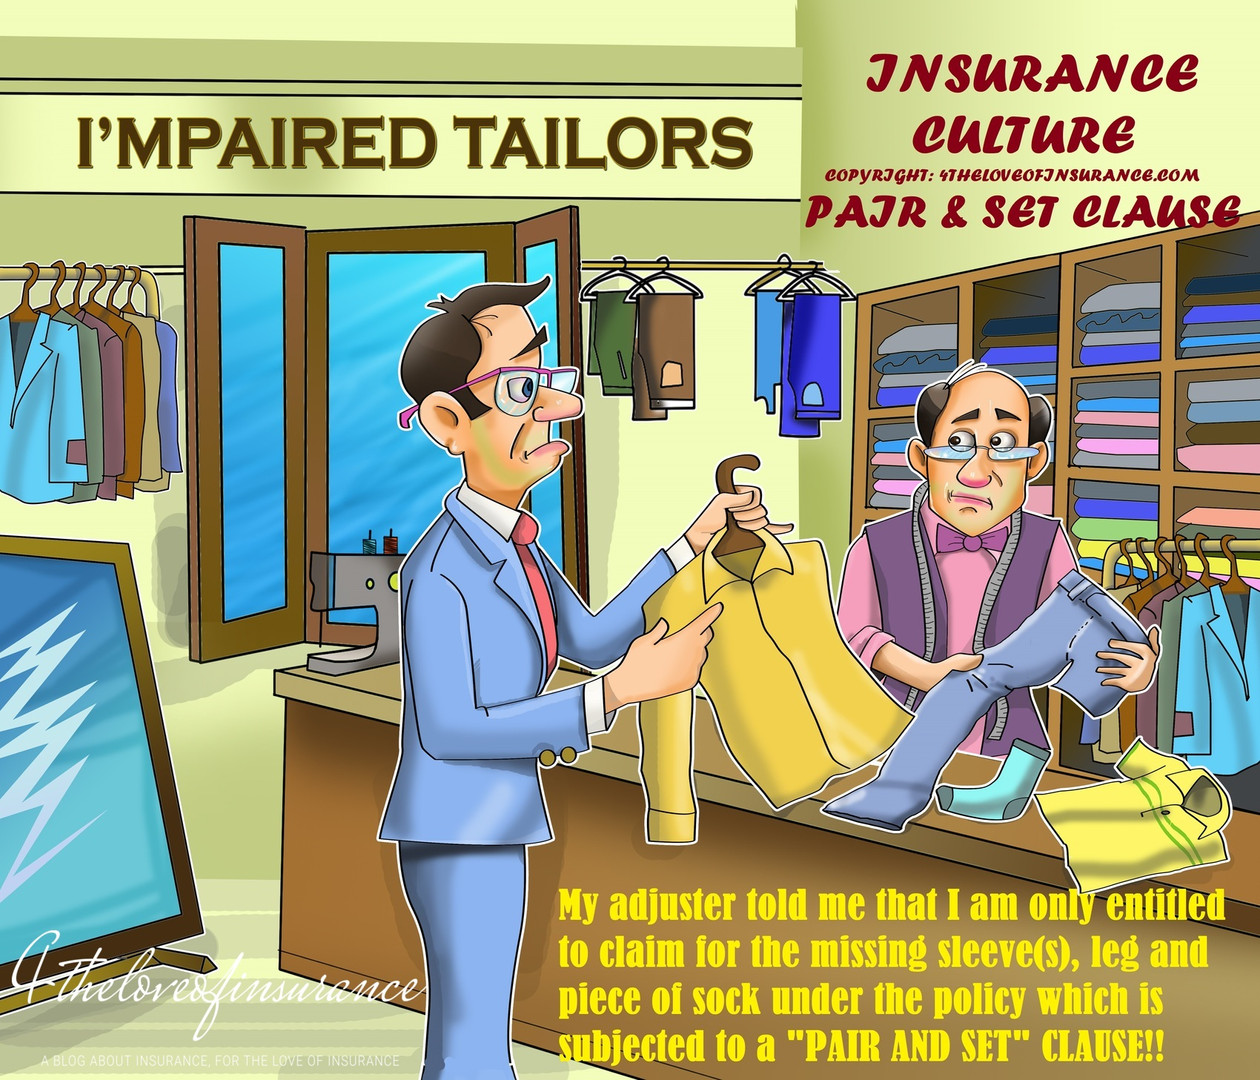 Pair & Set Clause